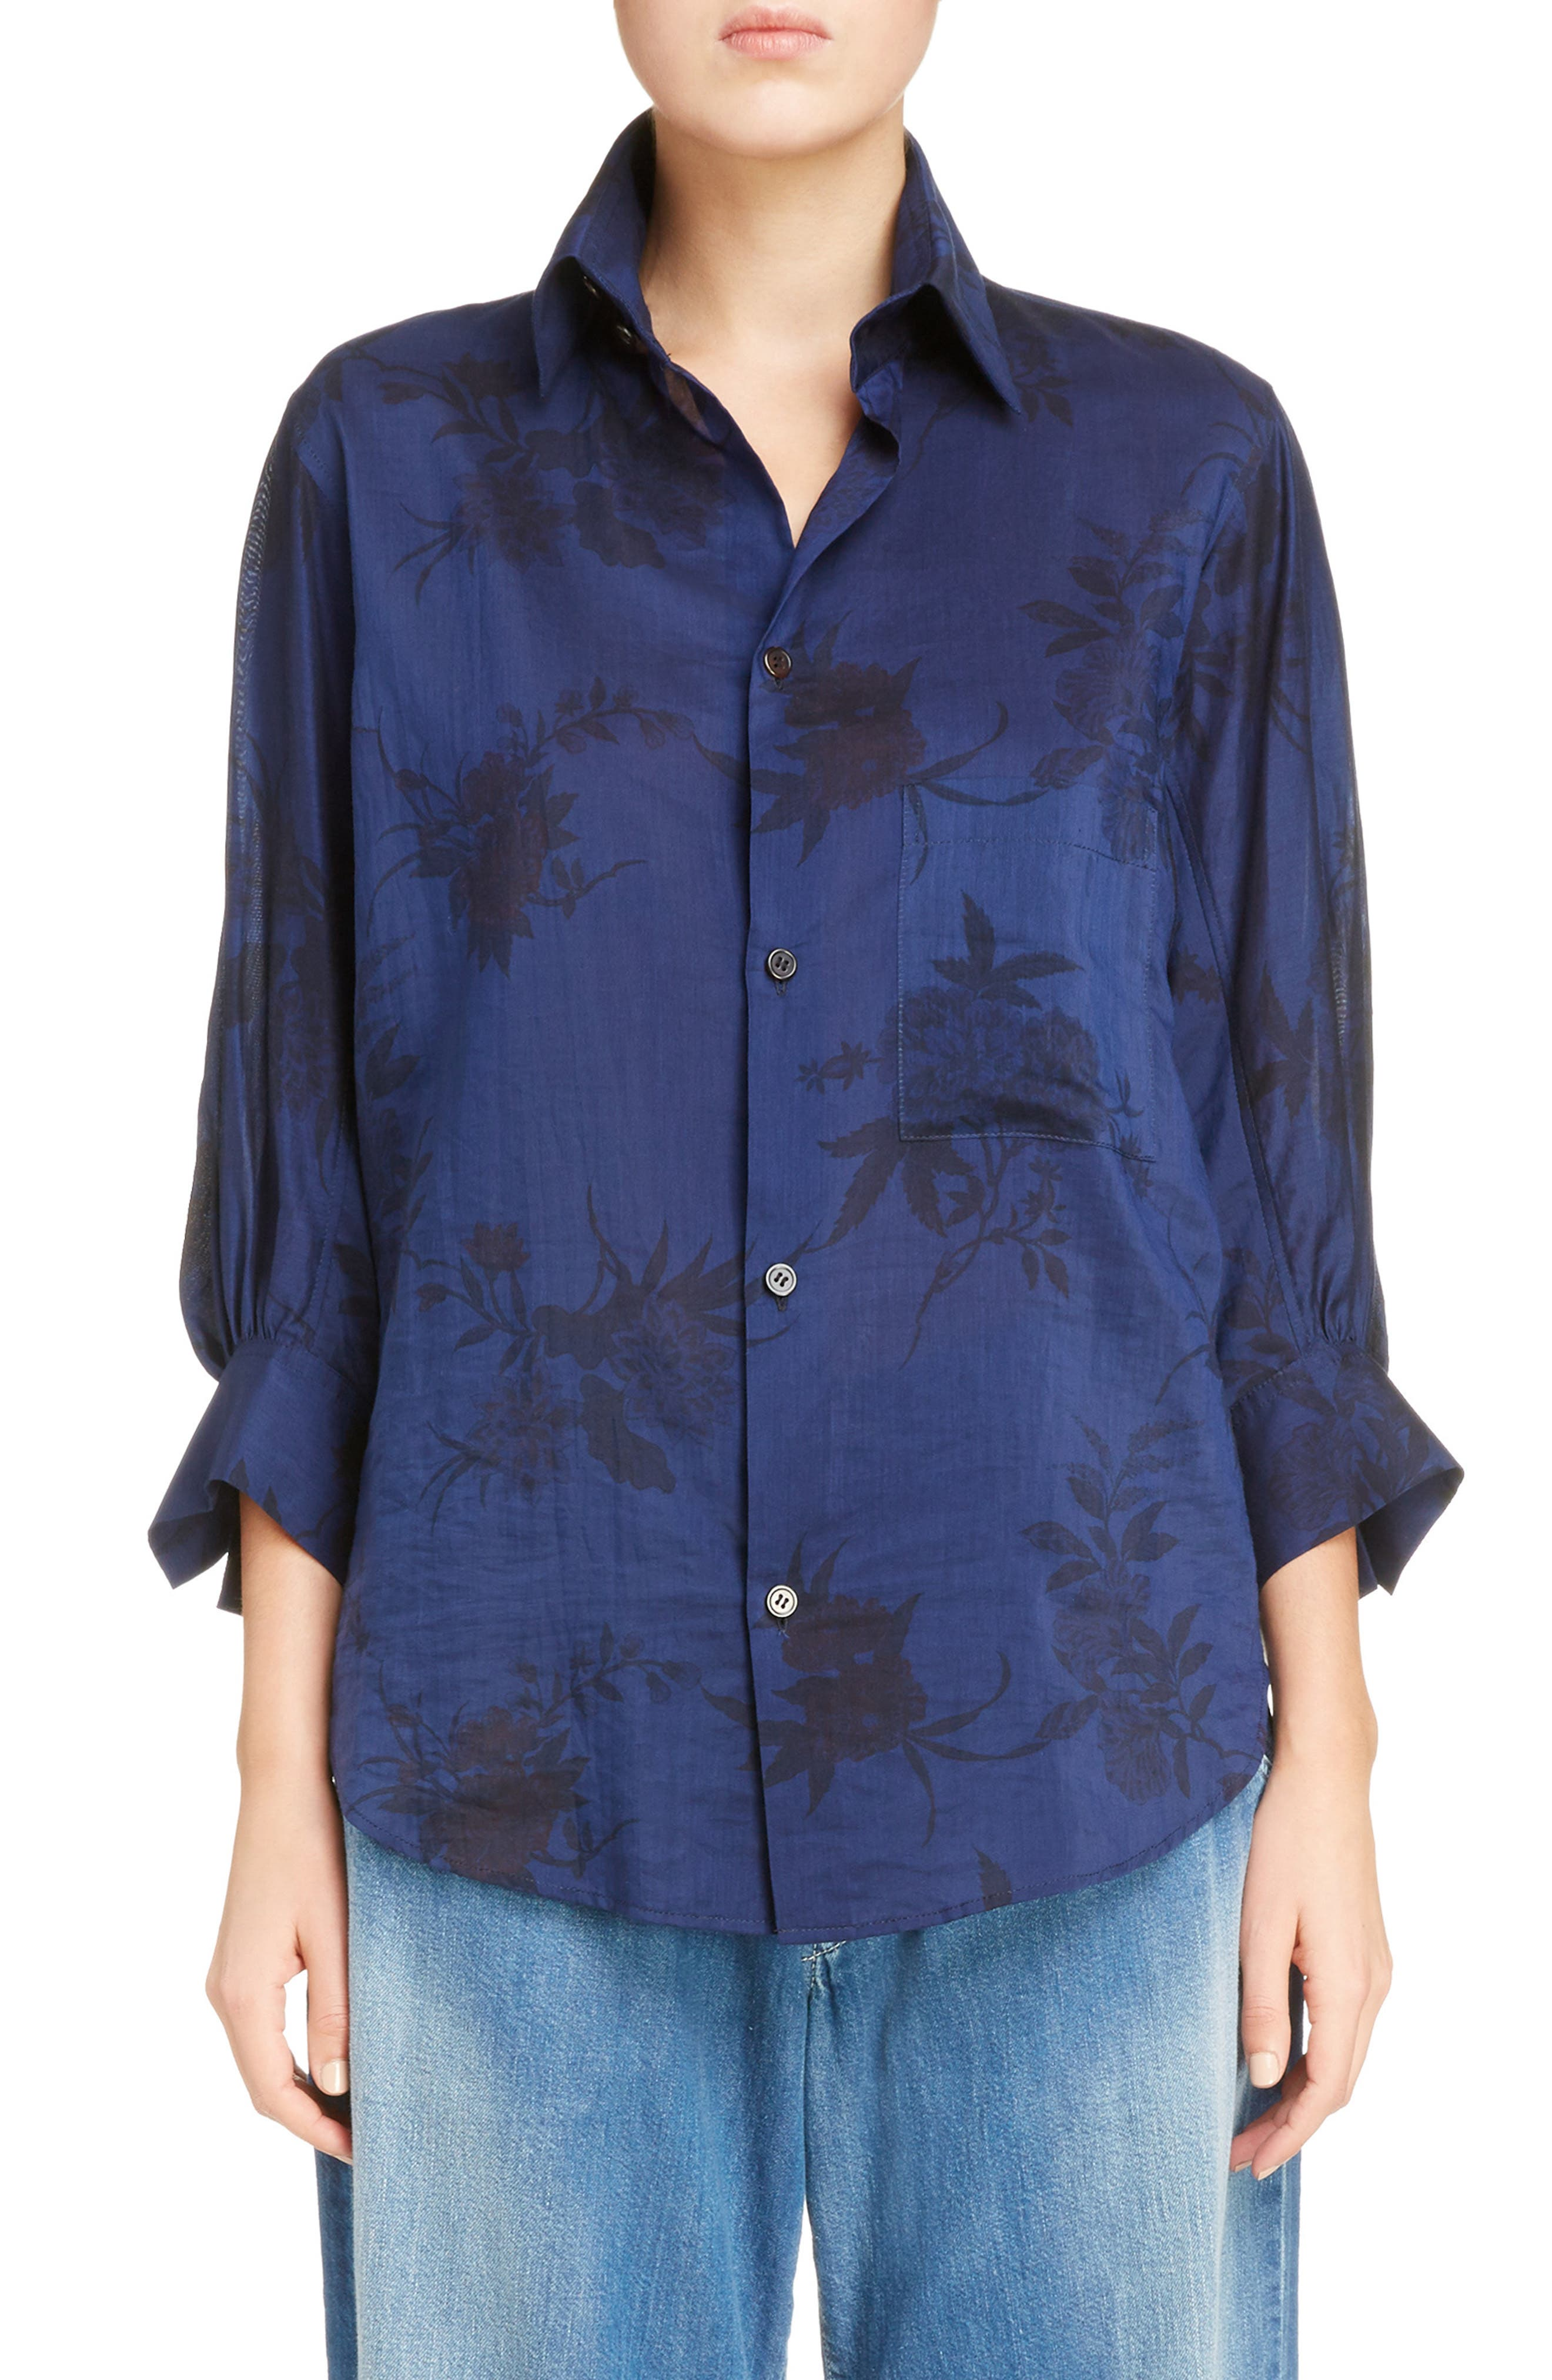 Main Image - Y's by Yohji Yamamoto Floral Print Shirt